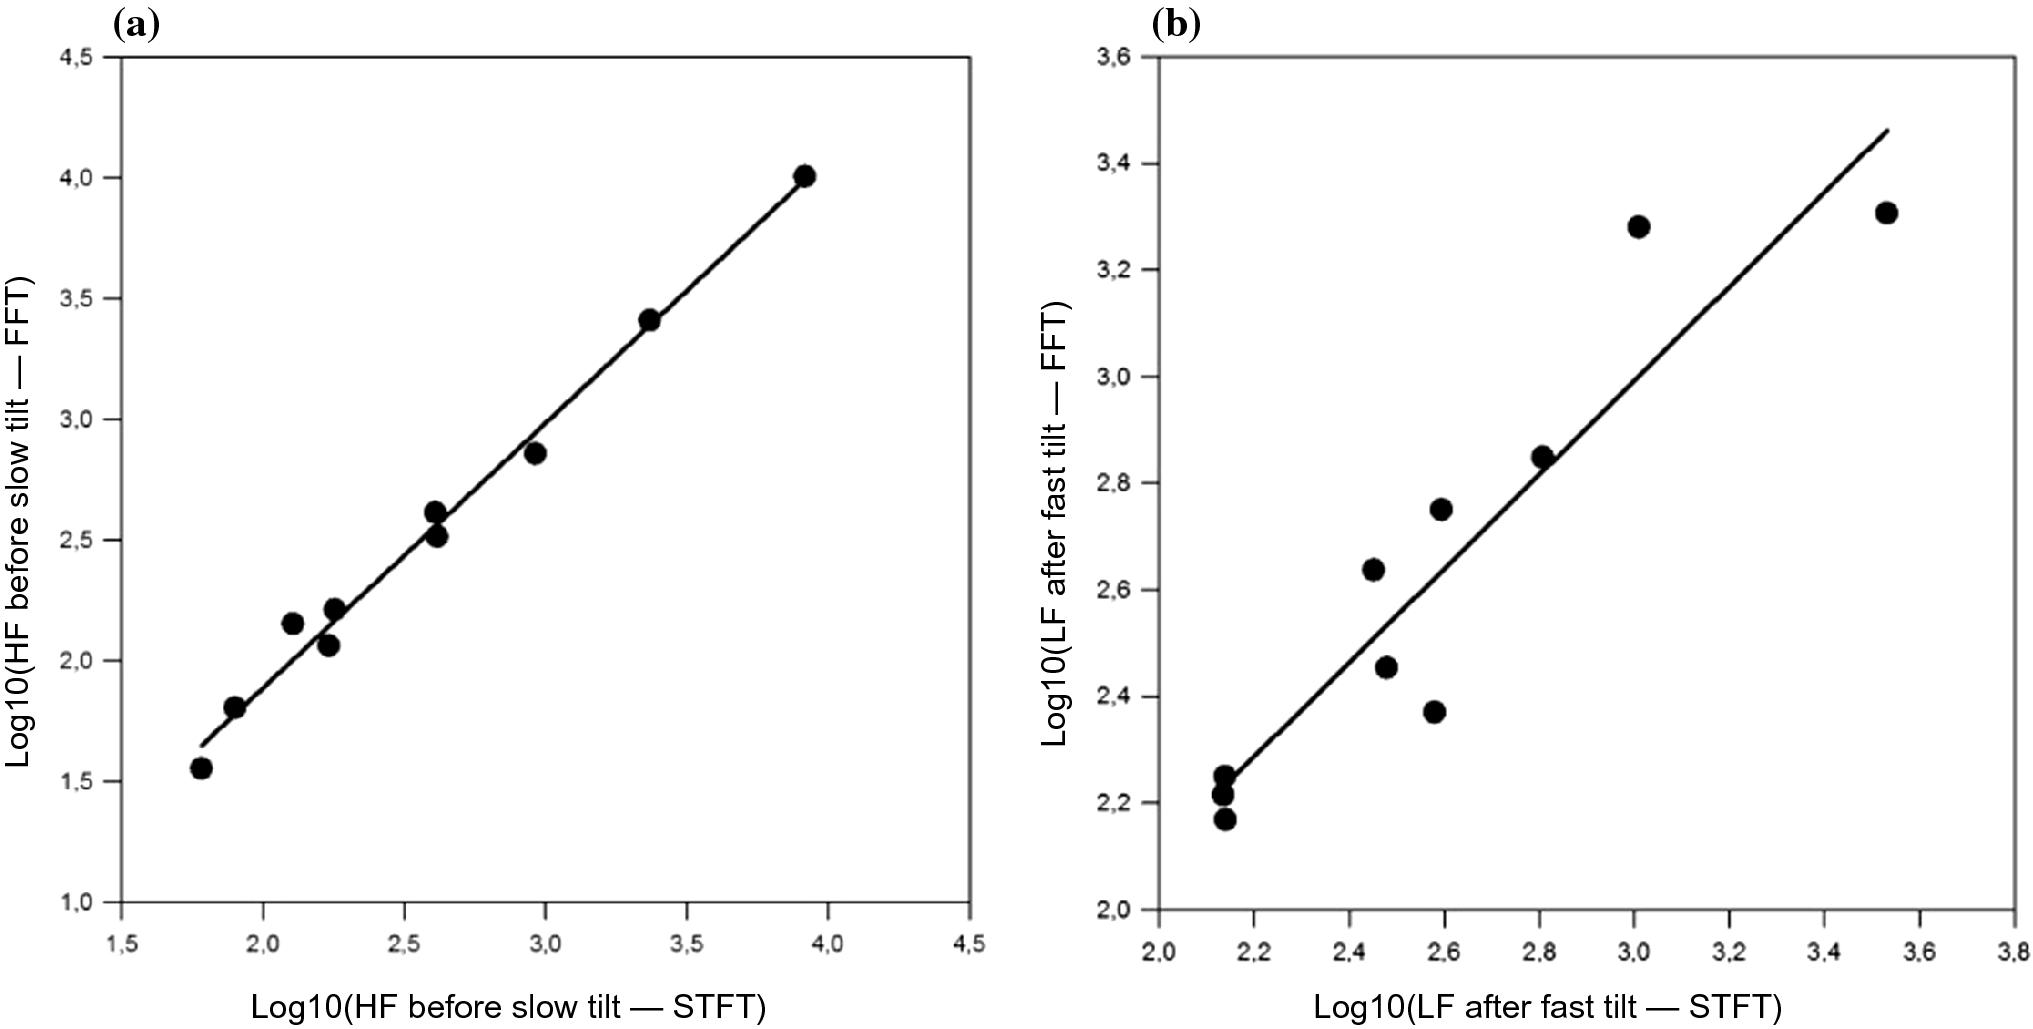 Quantification of Autonomic Response to Passive Change of Posture in